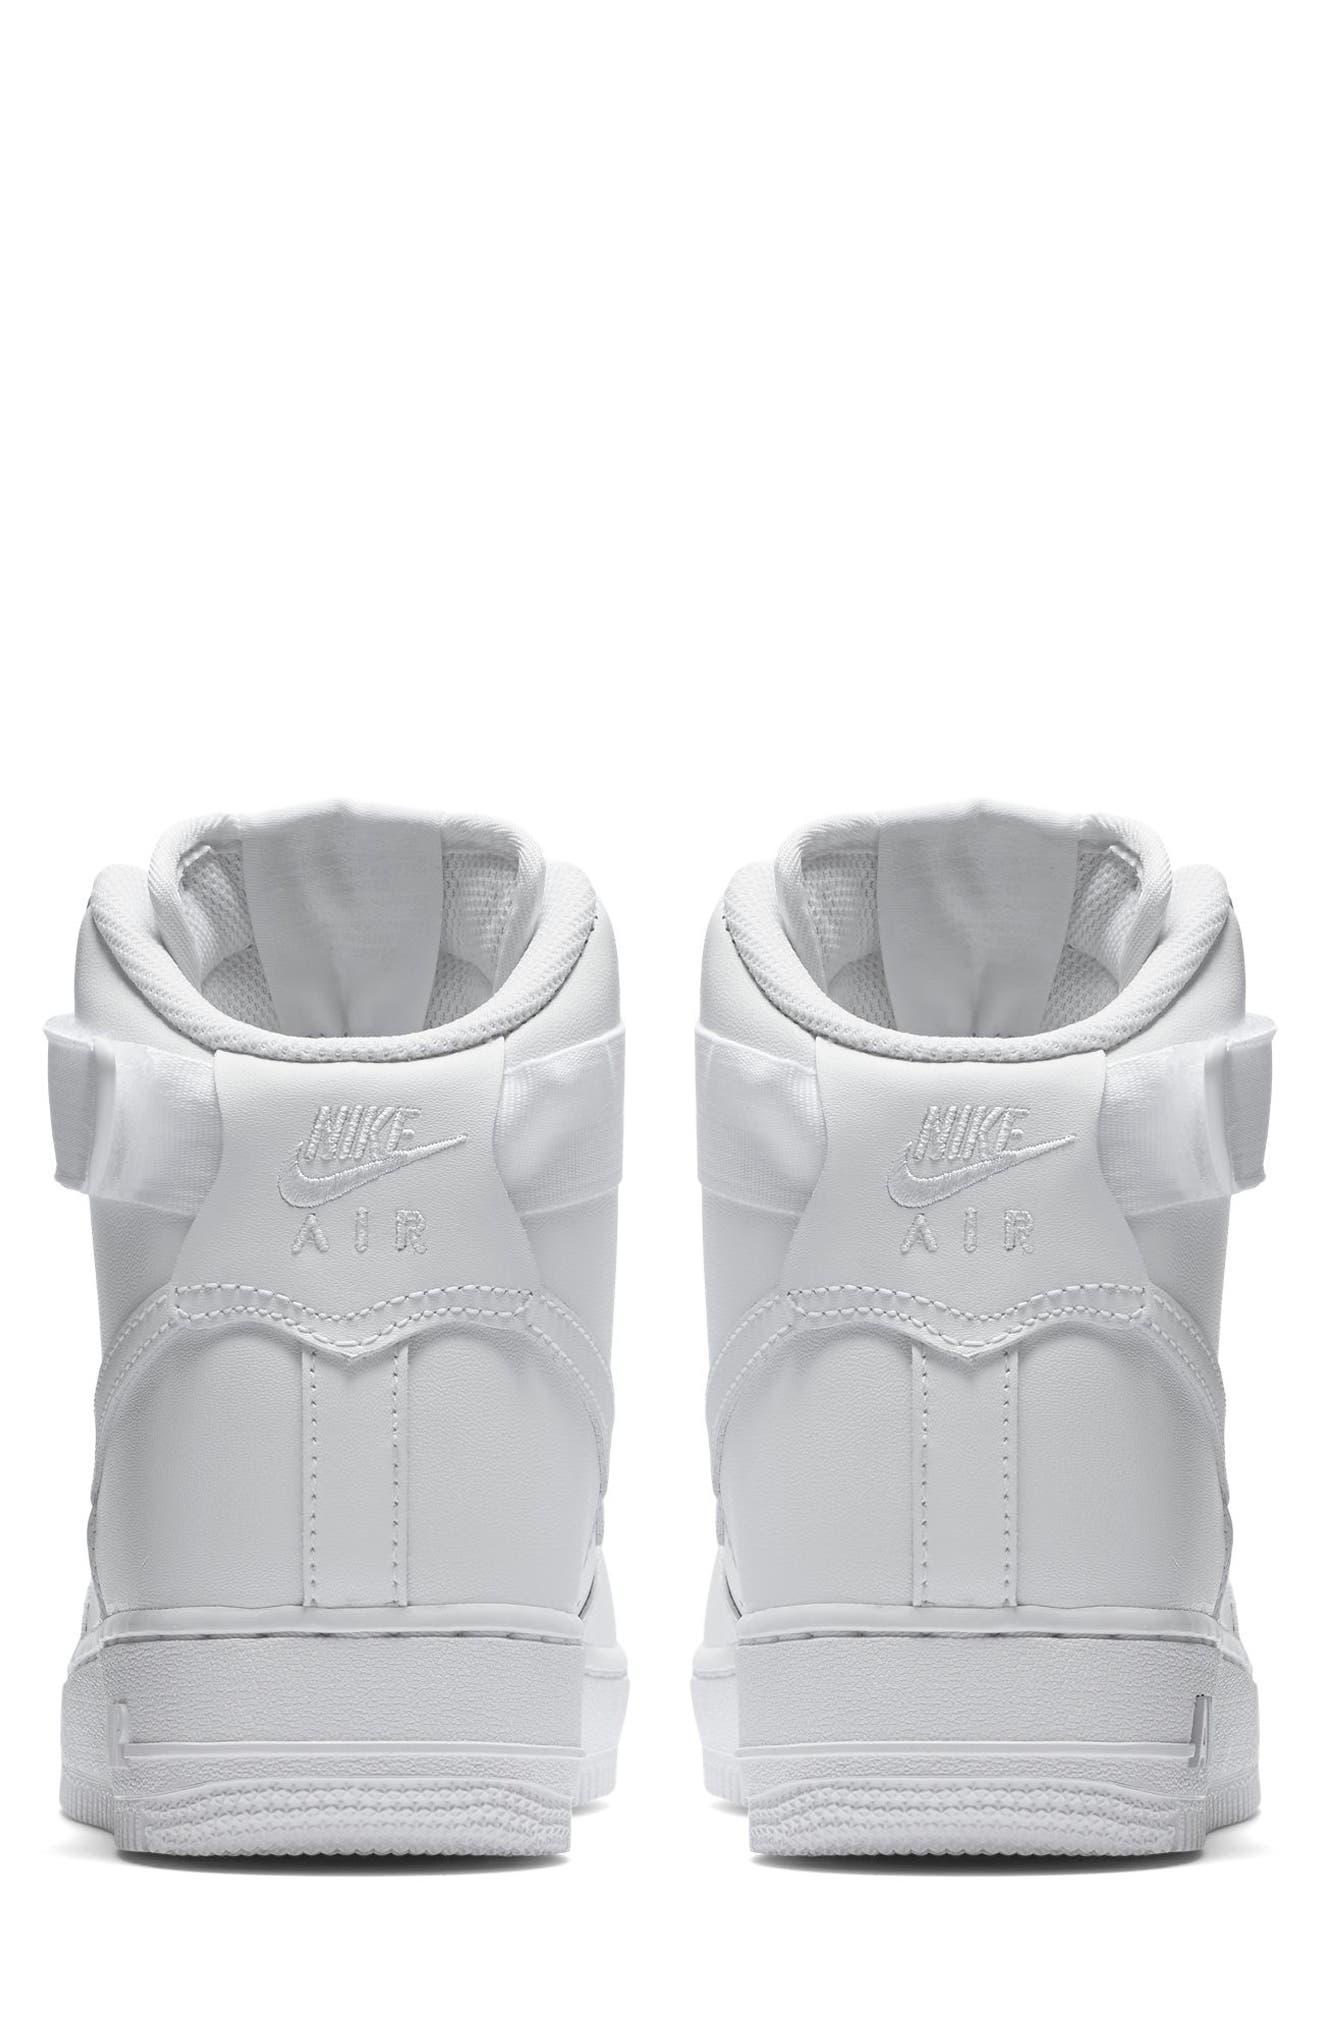 NIKE, Air Force 1 High Top Sneaker, Alternate thumbnail 2, color, WHITE/ WHITE/ WHITE